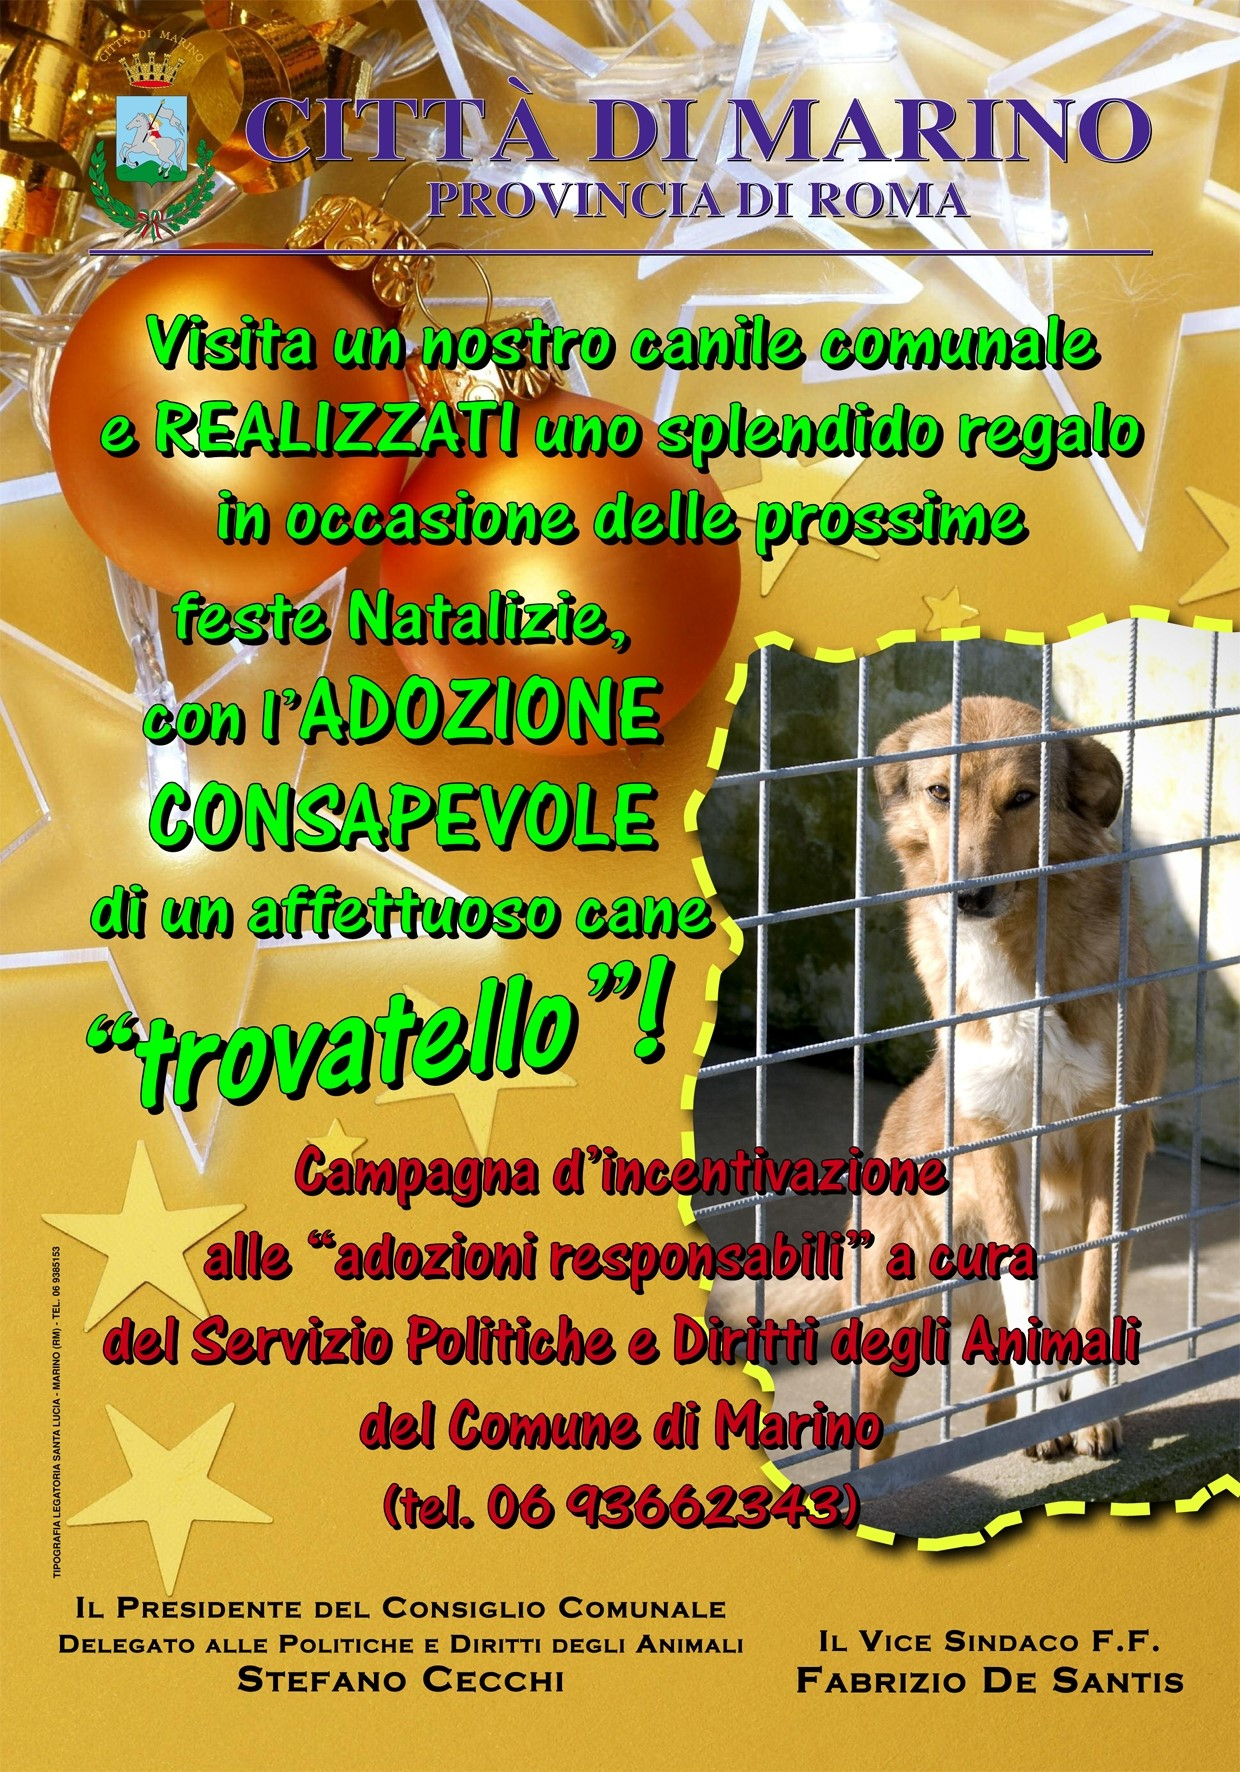 Campagna adozioni cani